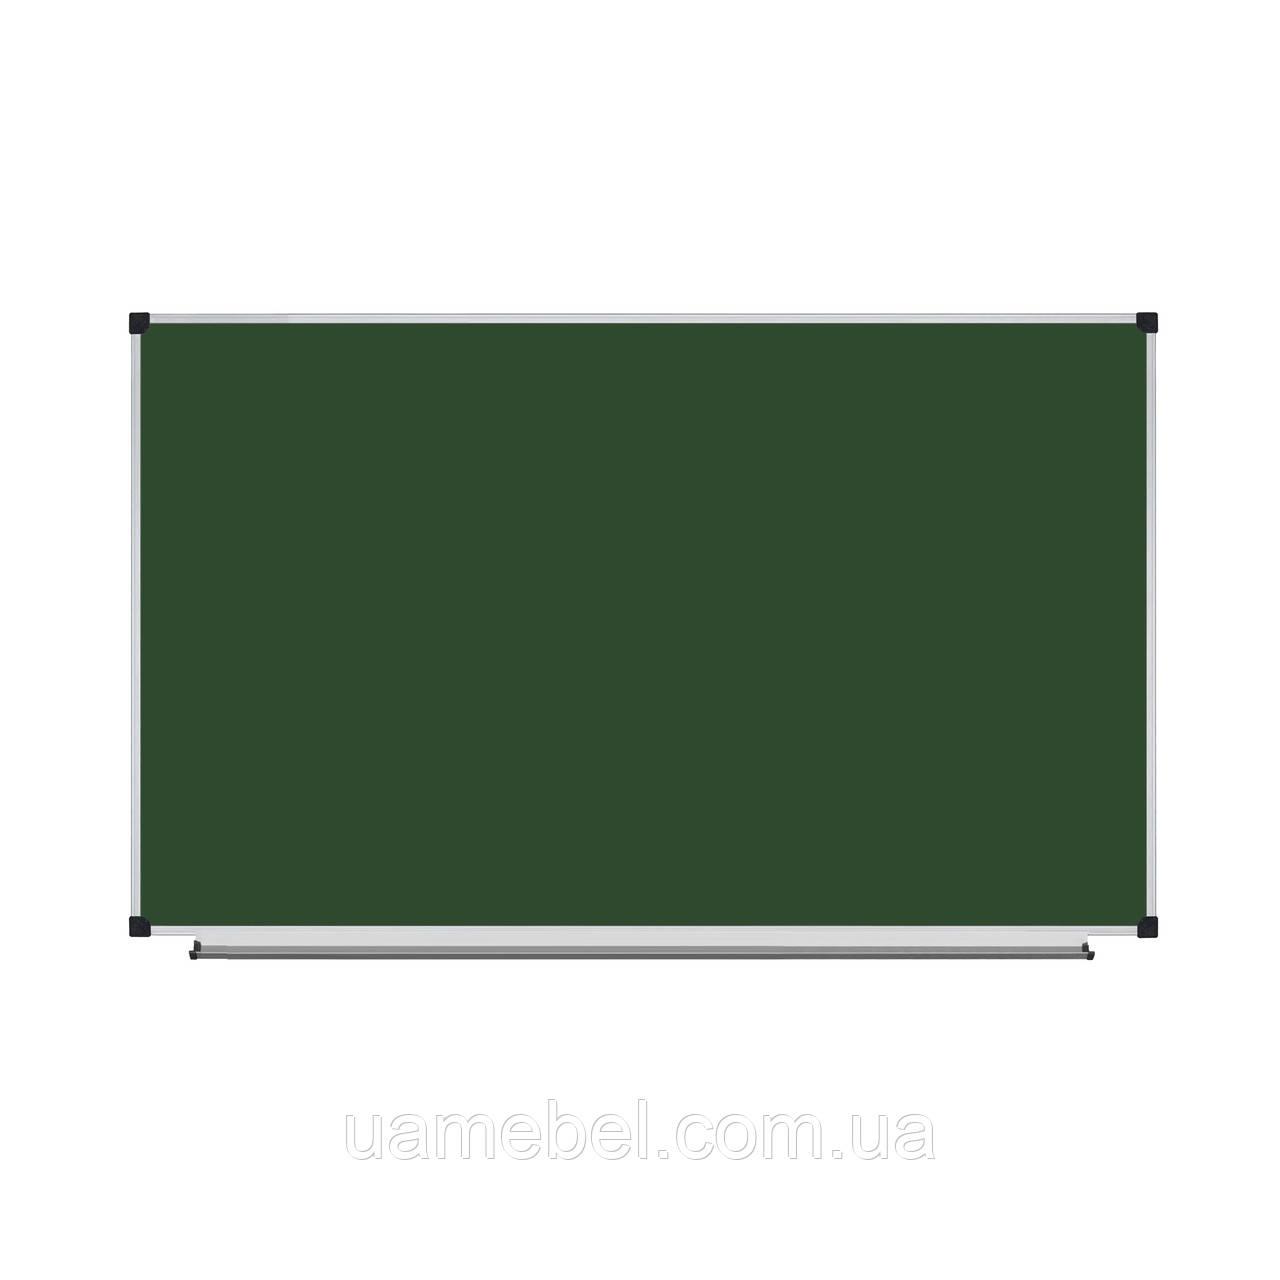 Школьная доска магнитная меловая 180х120 см